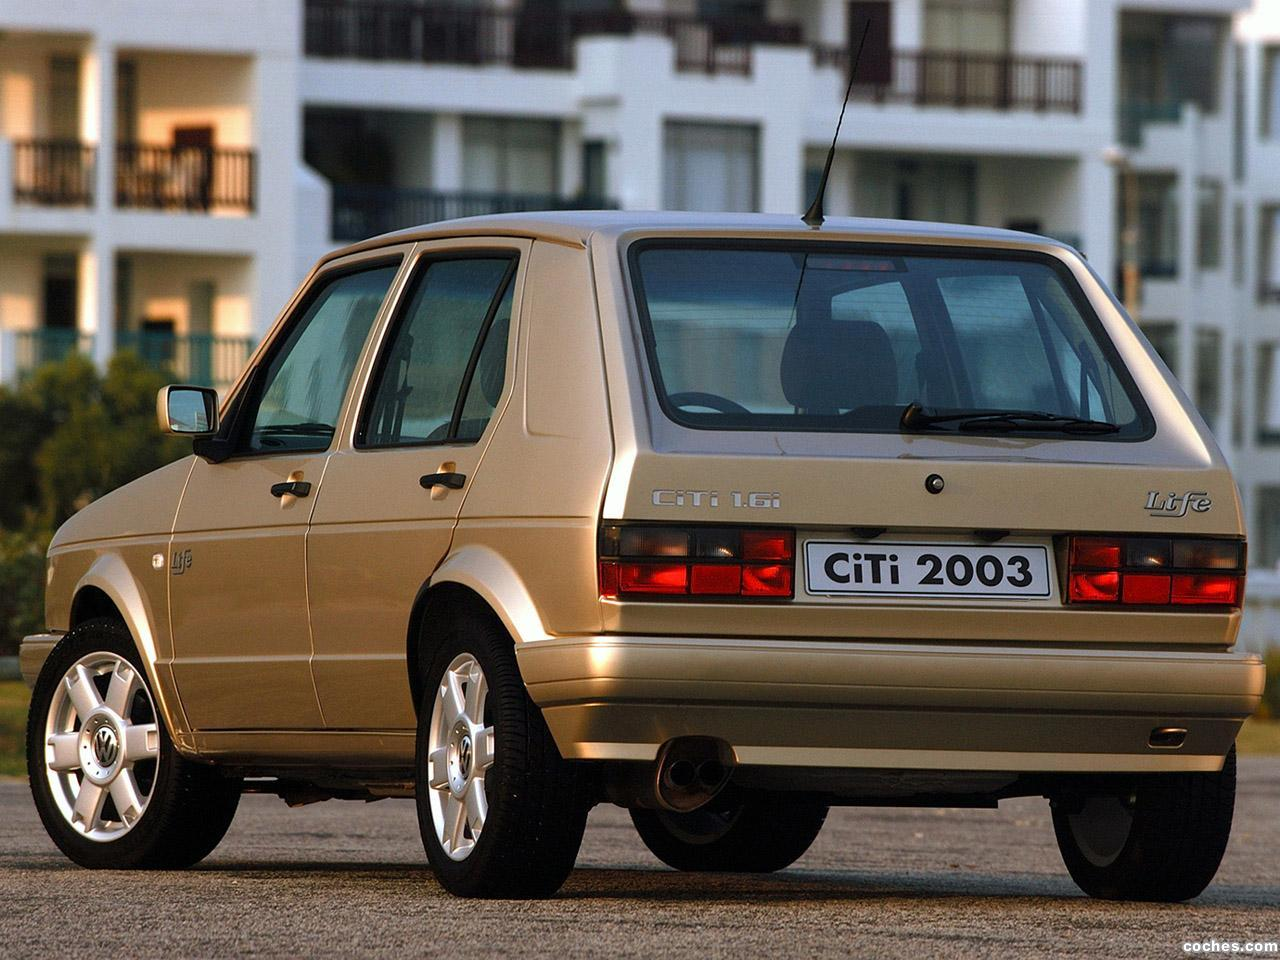 Foto 3 de Volkswagen Citi Life 2003